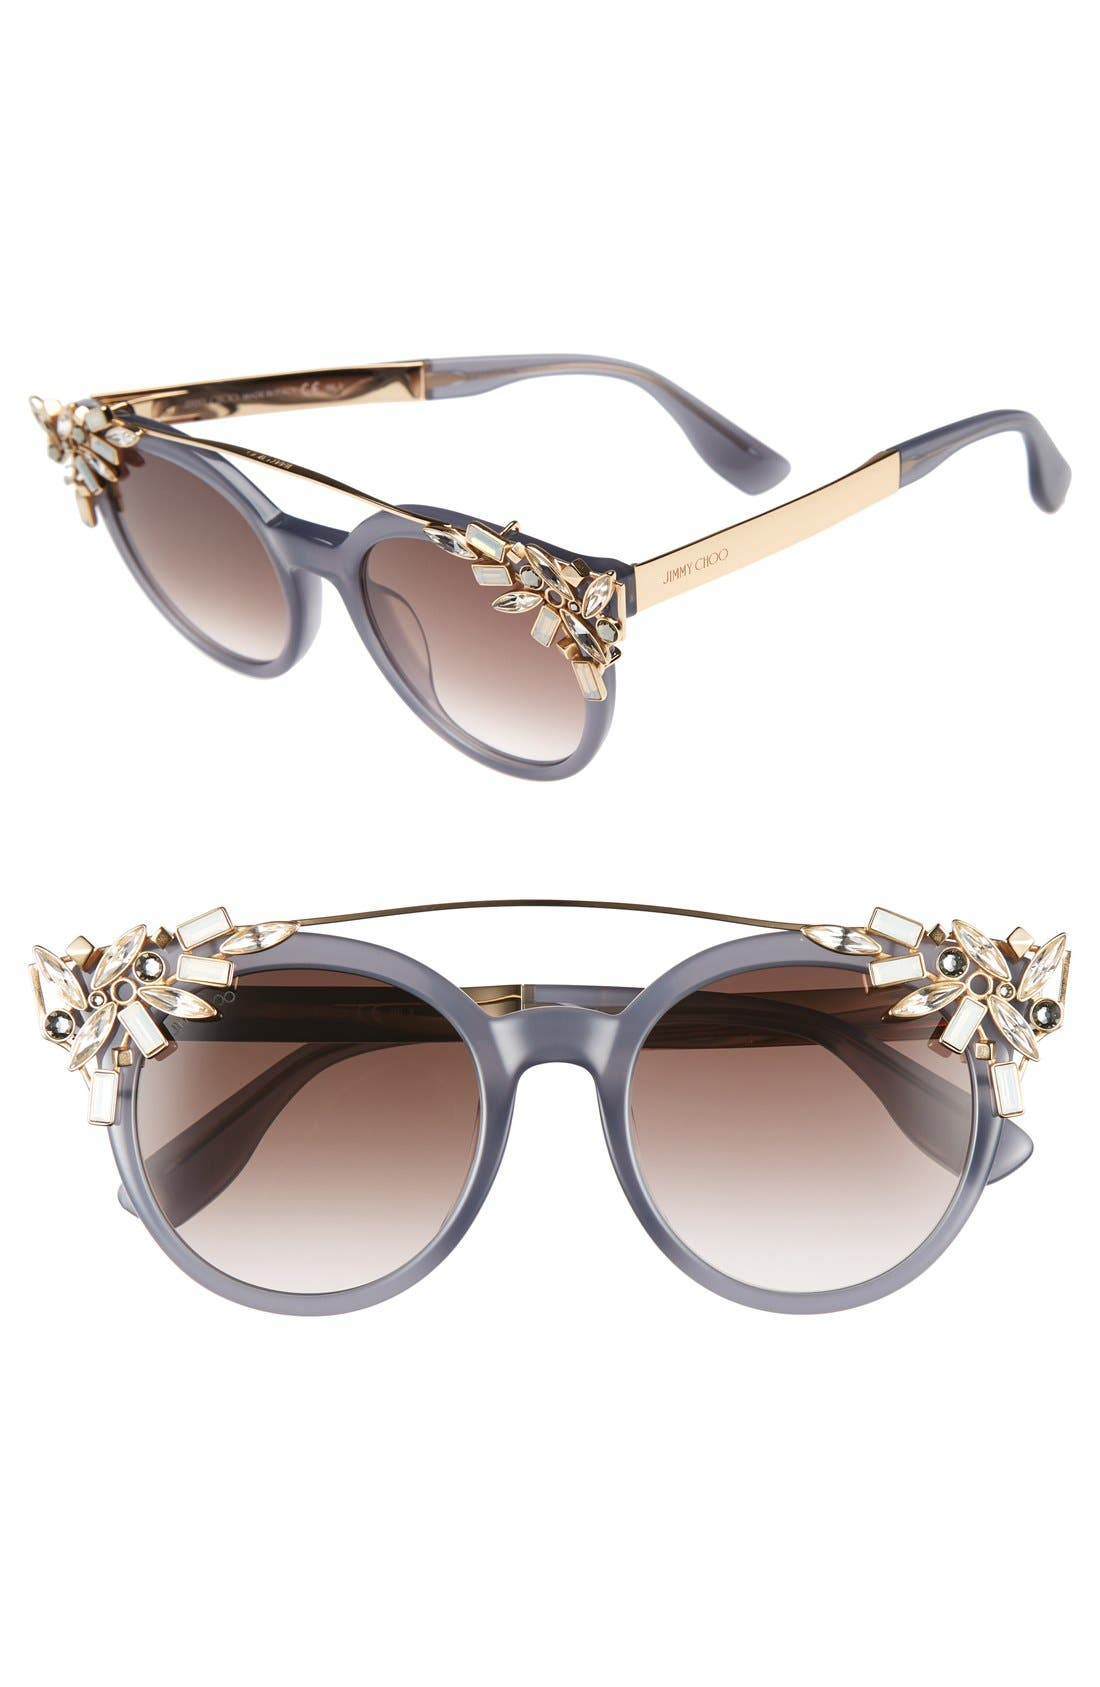 JIMMY CHOO Vivy 51mm Sunglasses